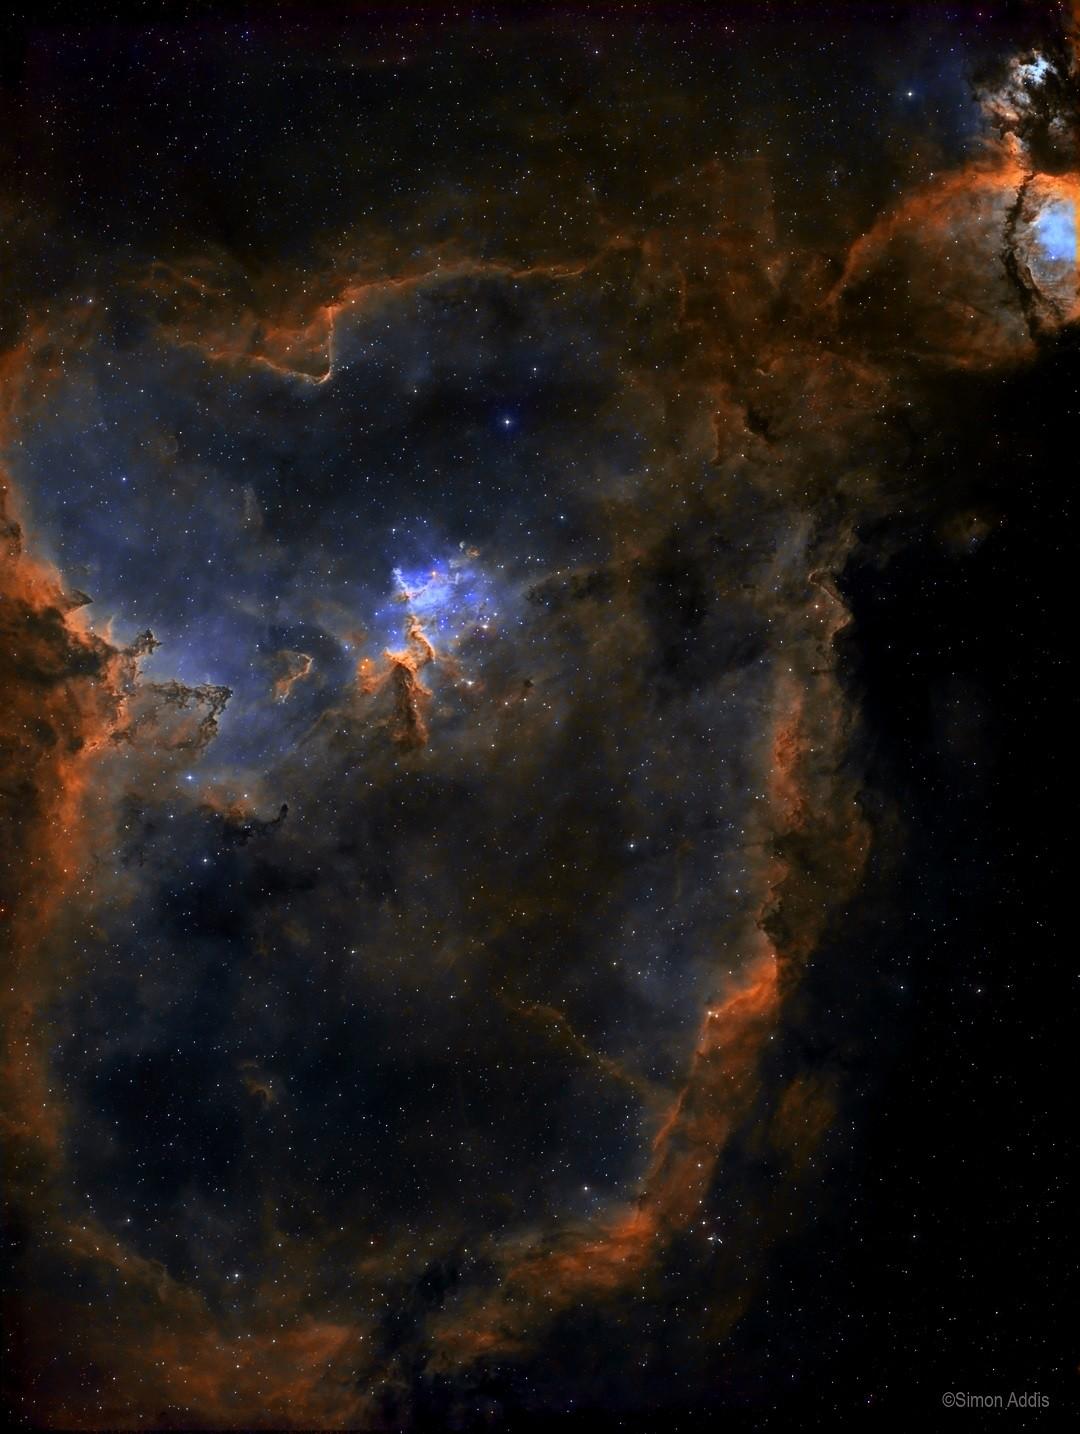 http://apod.nasa.gov/apod/image/1510/Heart_Addis_2504.jpg